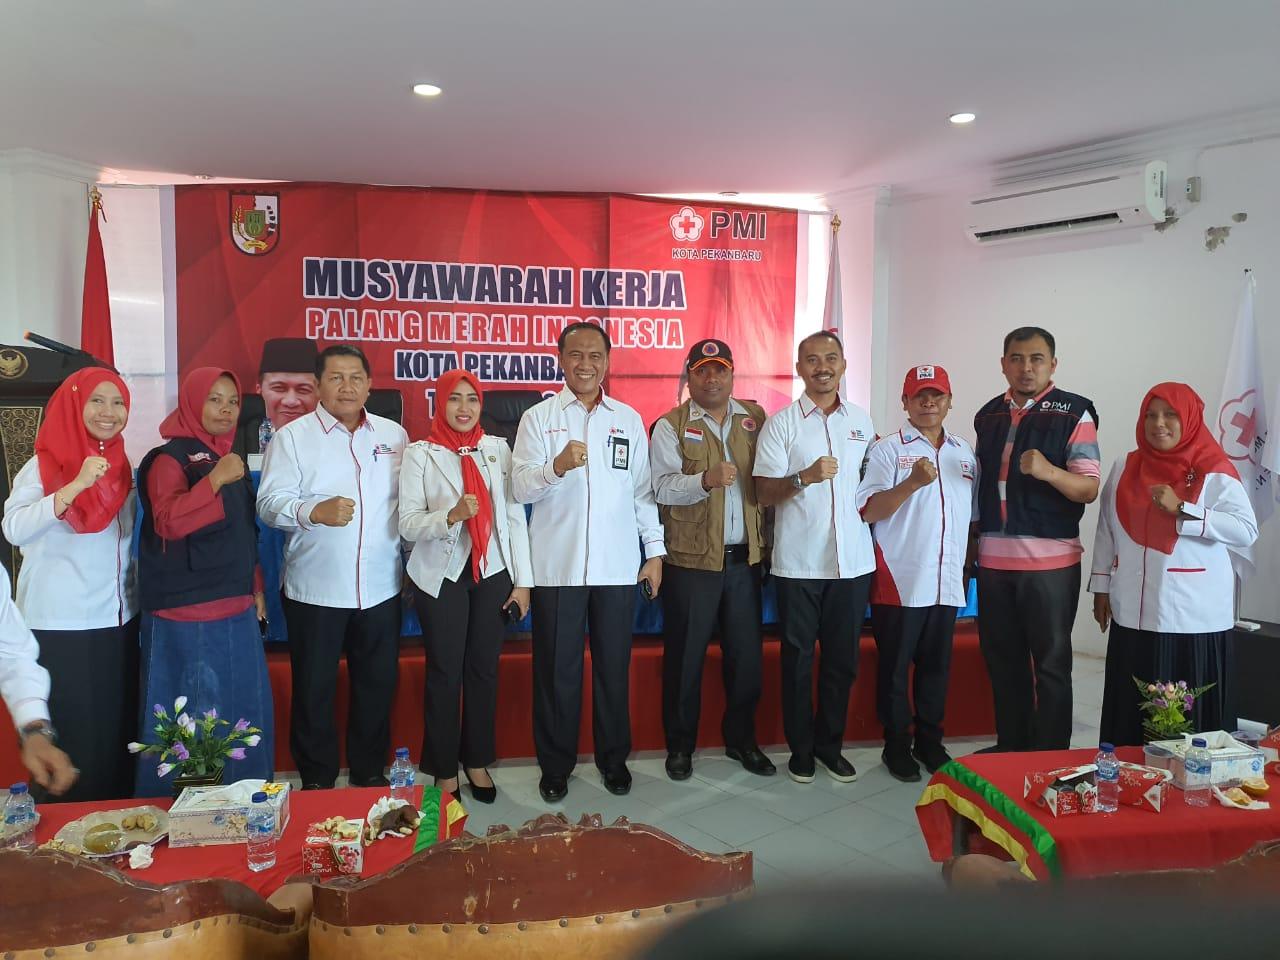 Image : Evaluasi Program Kerja, PMI Pekanbaru Gelar Musyawarah Kerja Perdana.